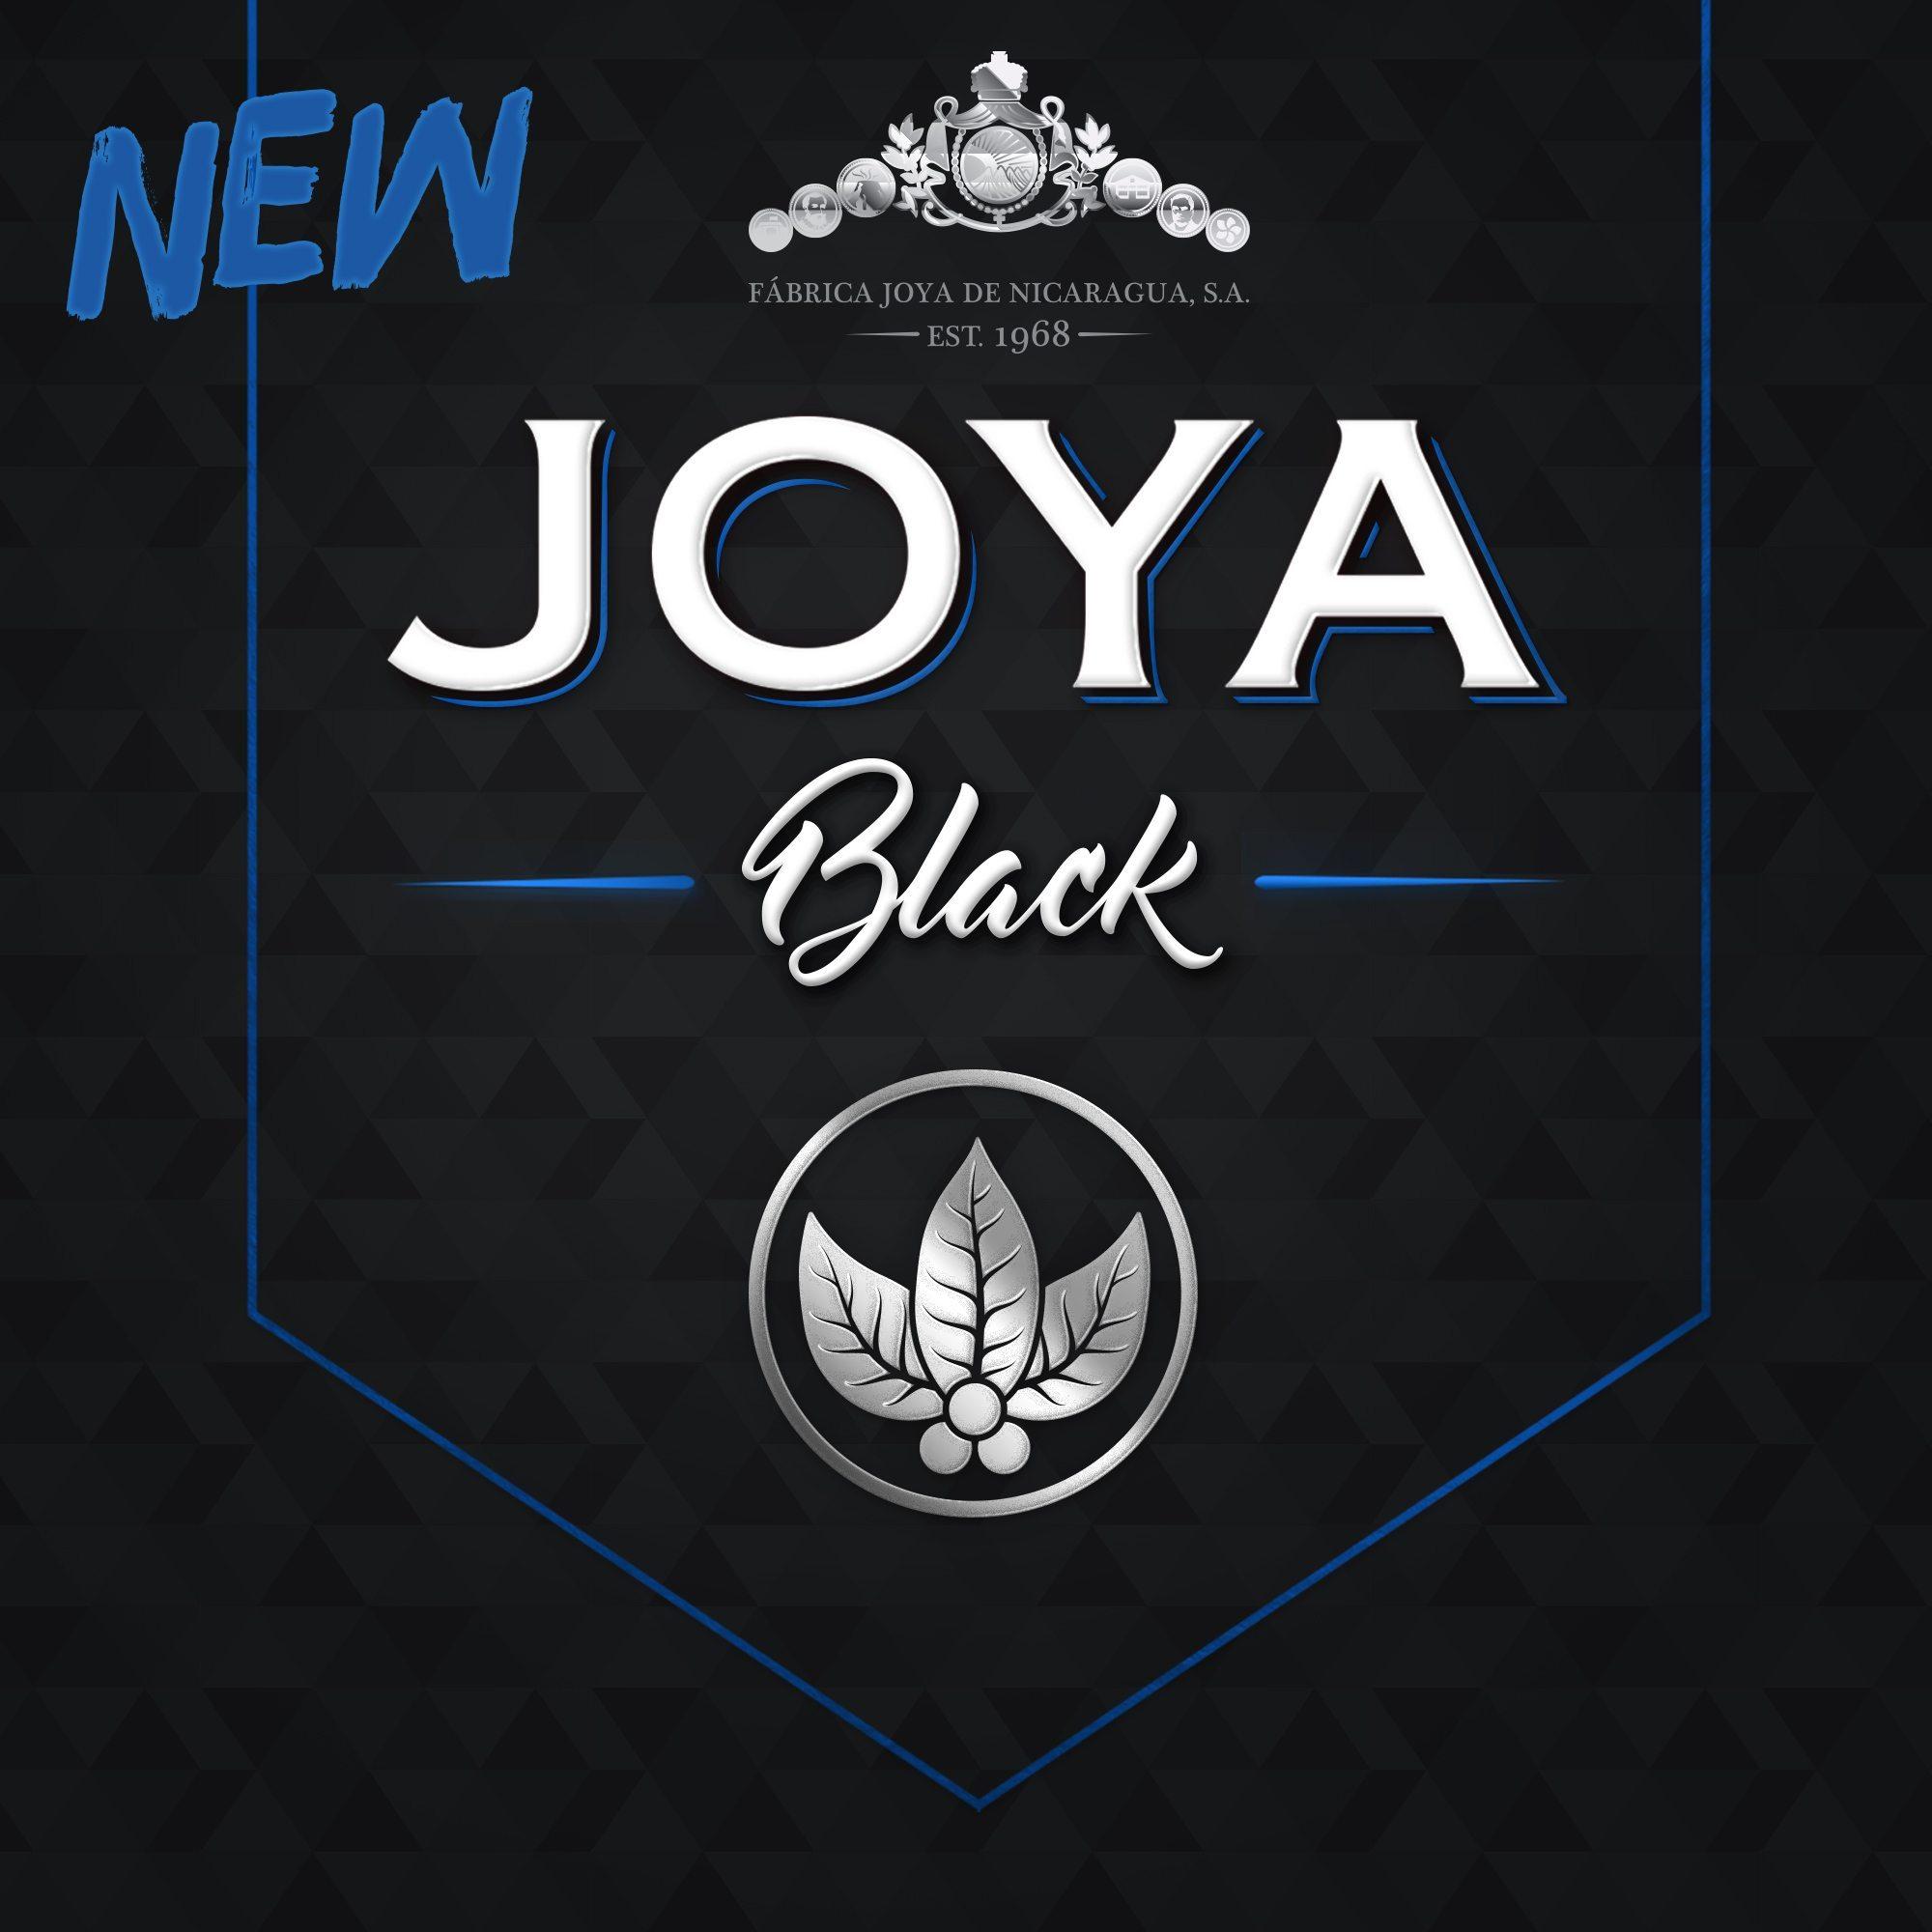 Cigar News: Joya de Nicaragua Announces Joya Black